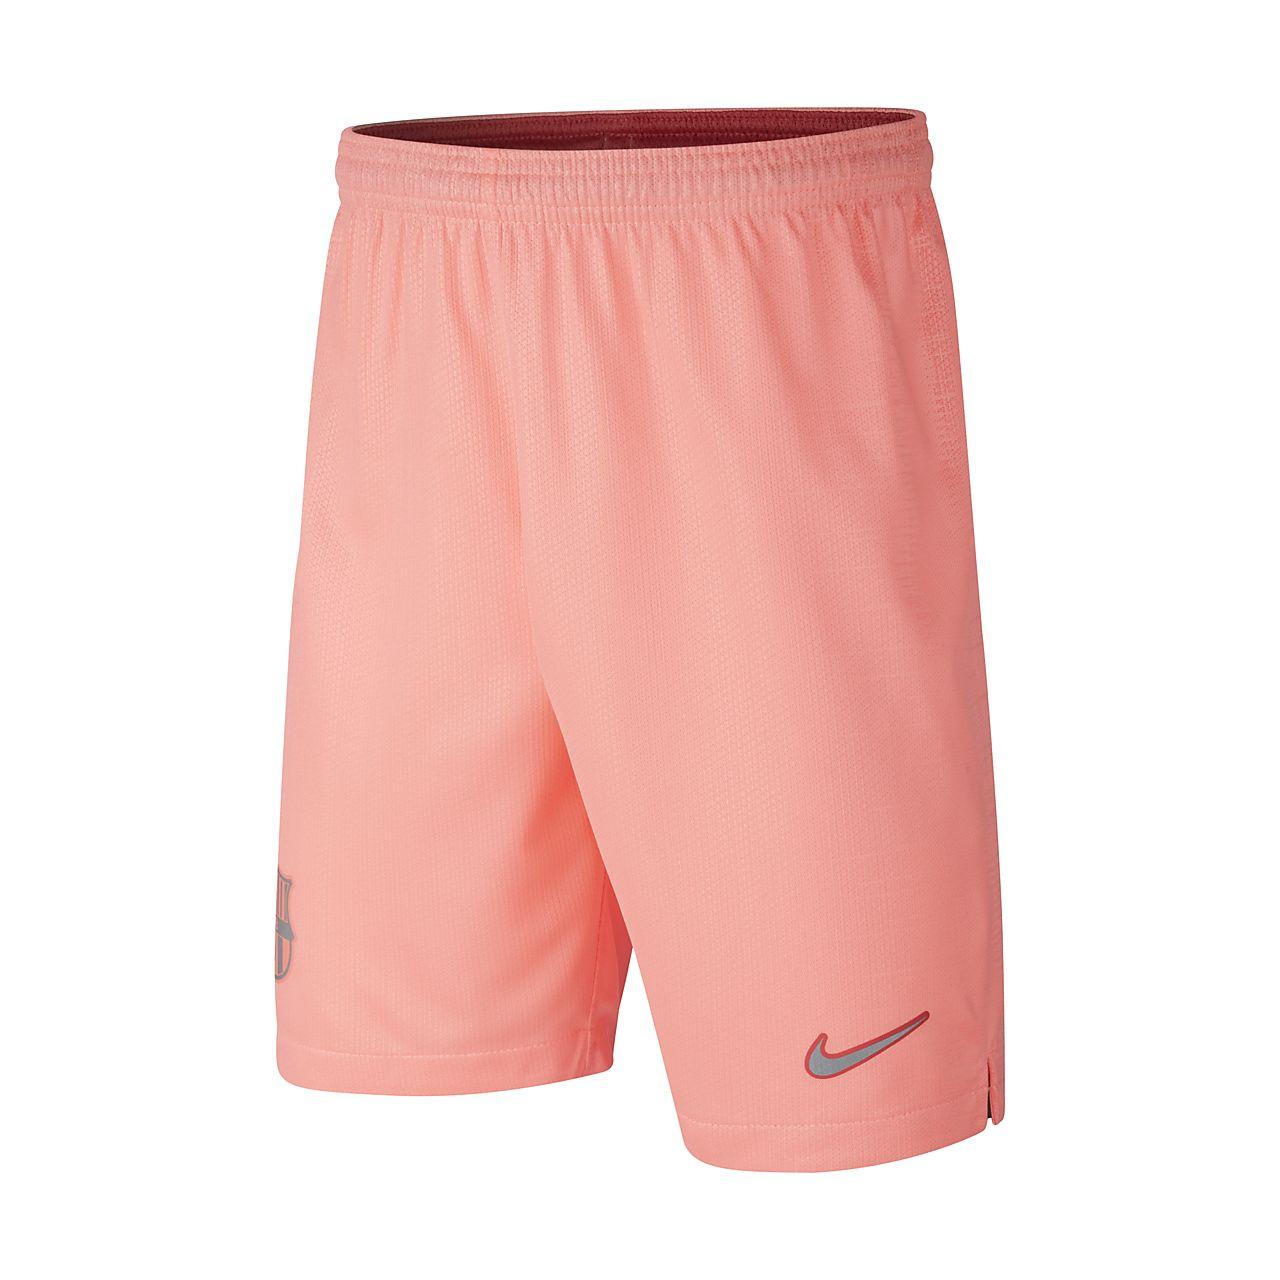 7e19b62080d ... Shorts de fútbol para niños talla grande 2018 19 FC Barcelona Stadium  Third